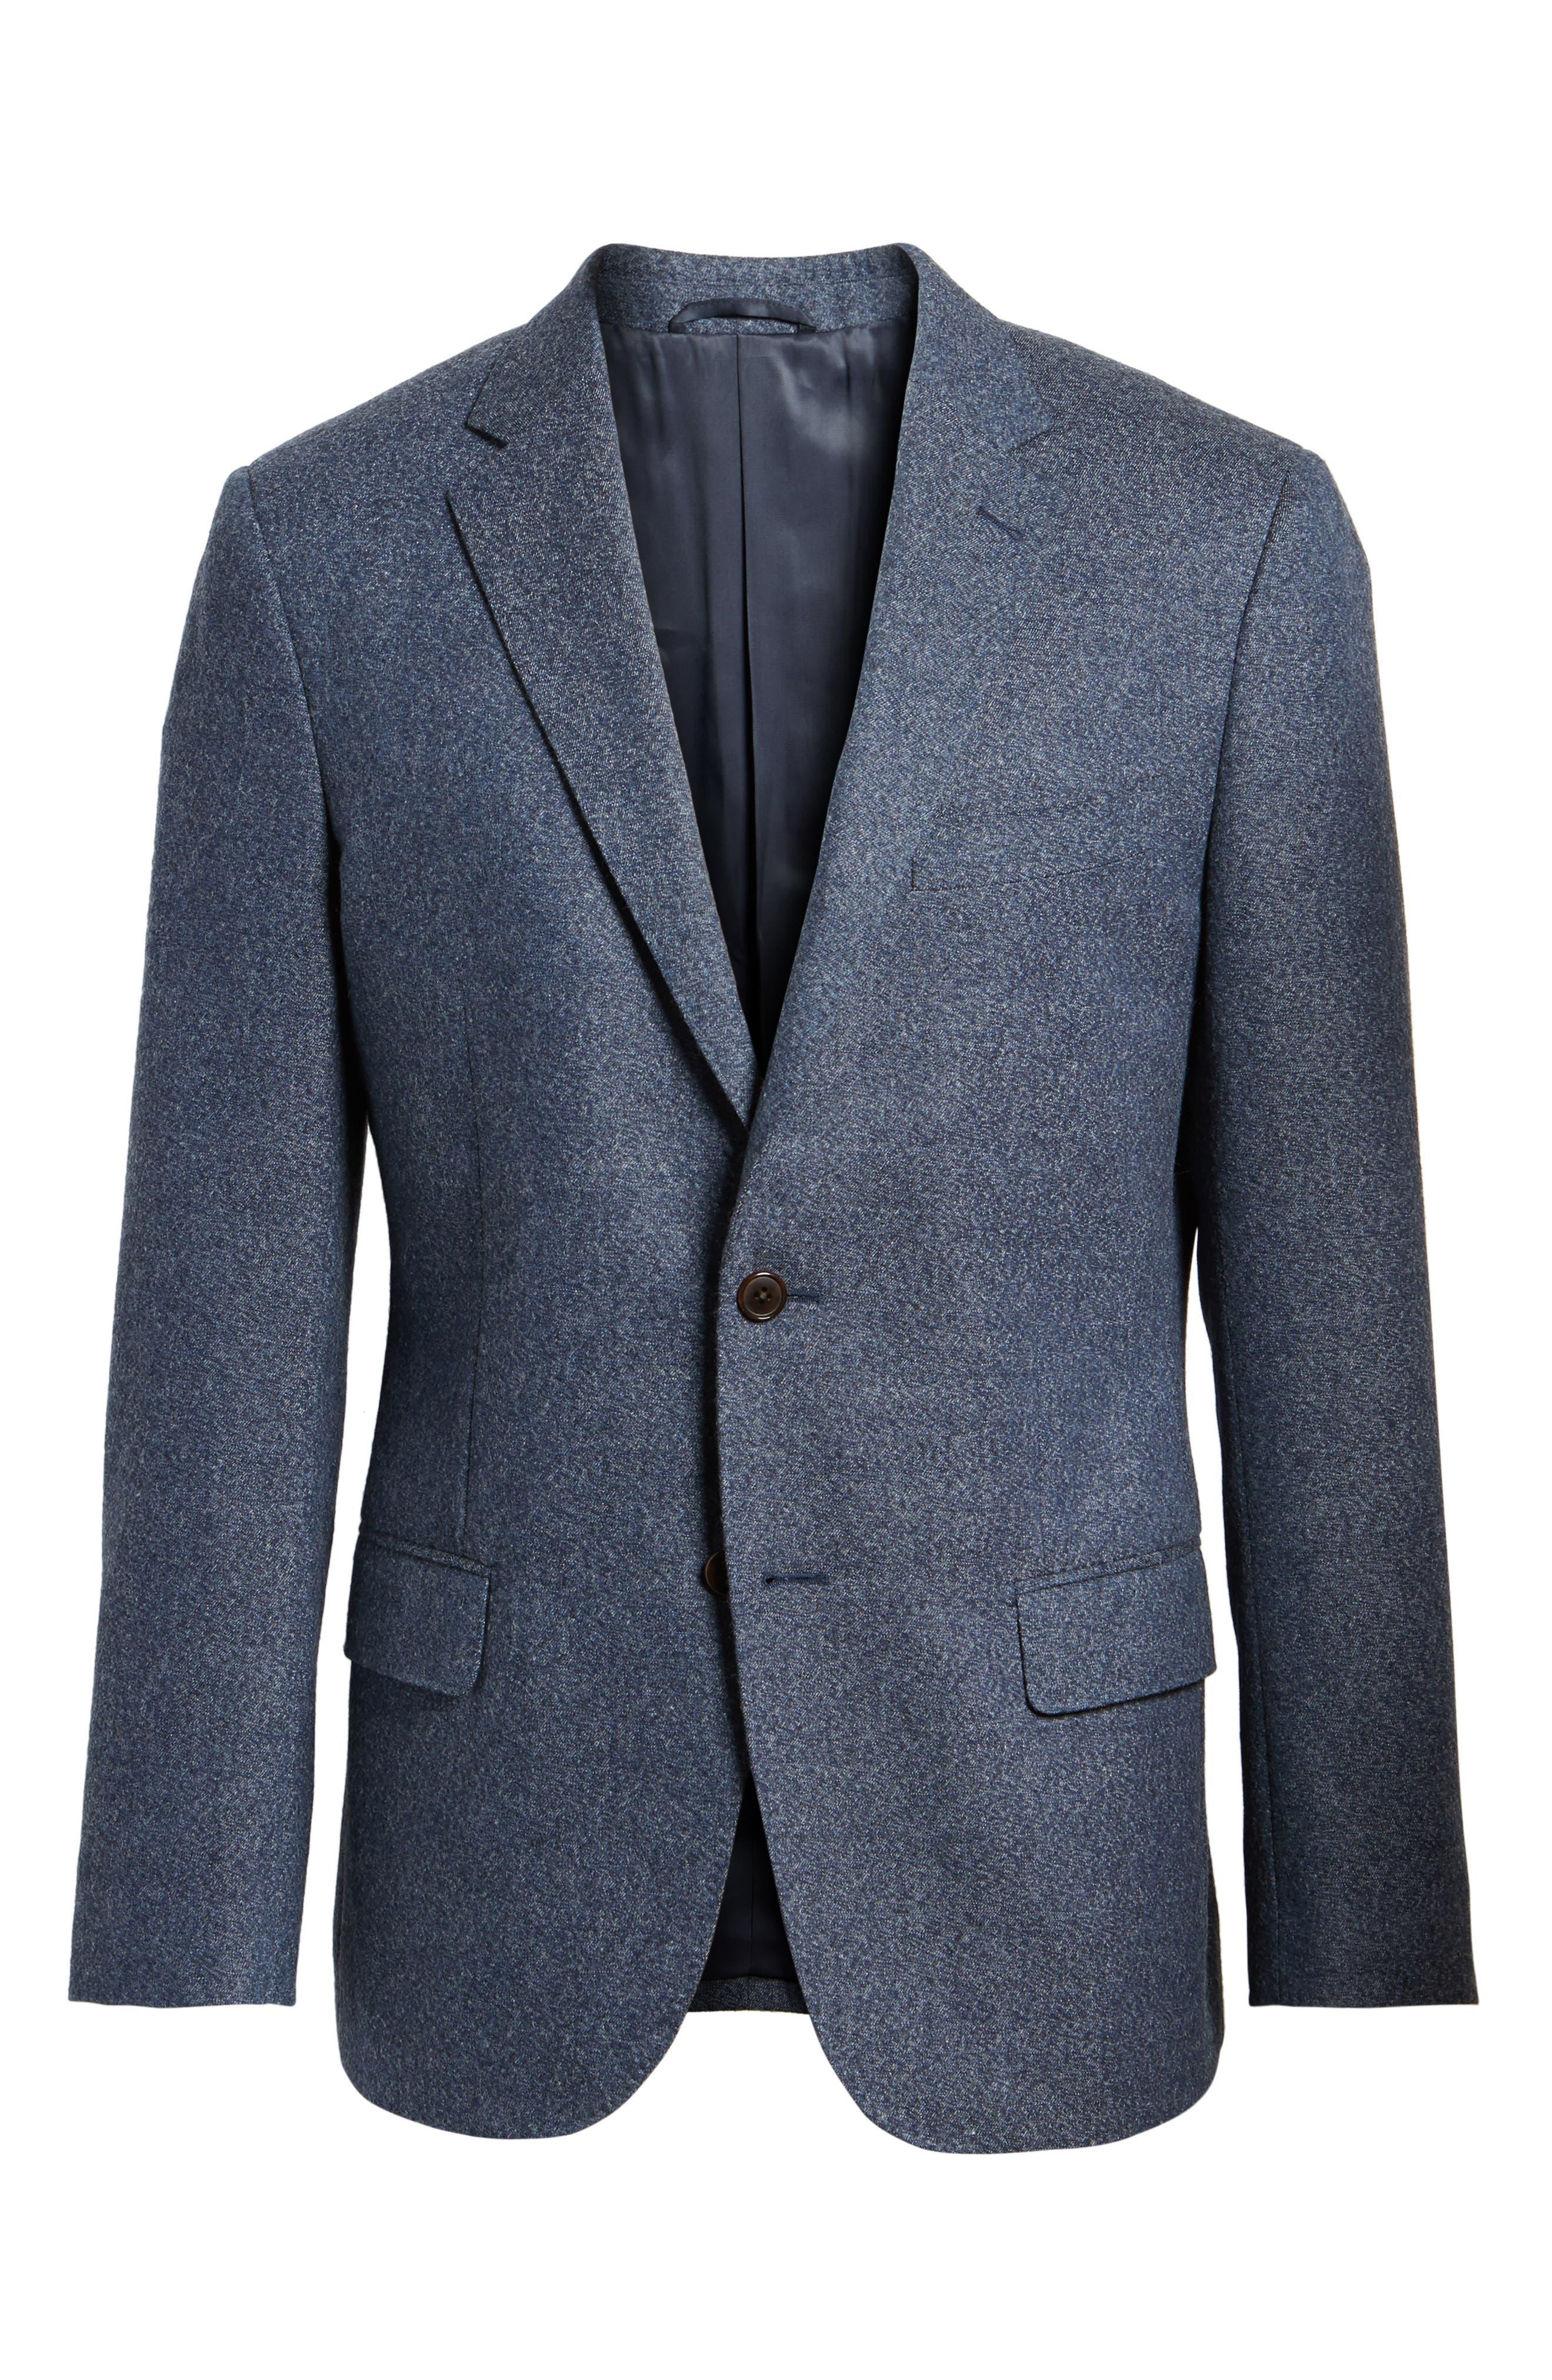 Charleston Wool Blend Sport Coat,                             Alternate thumbnail 5, color,                             414